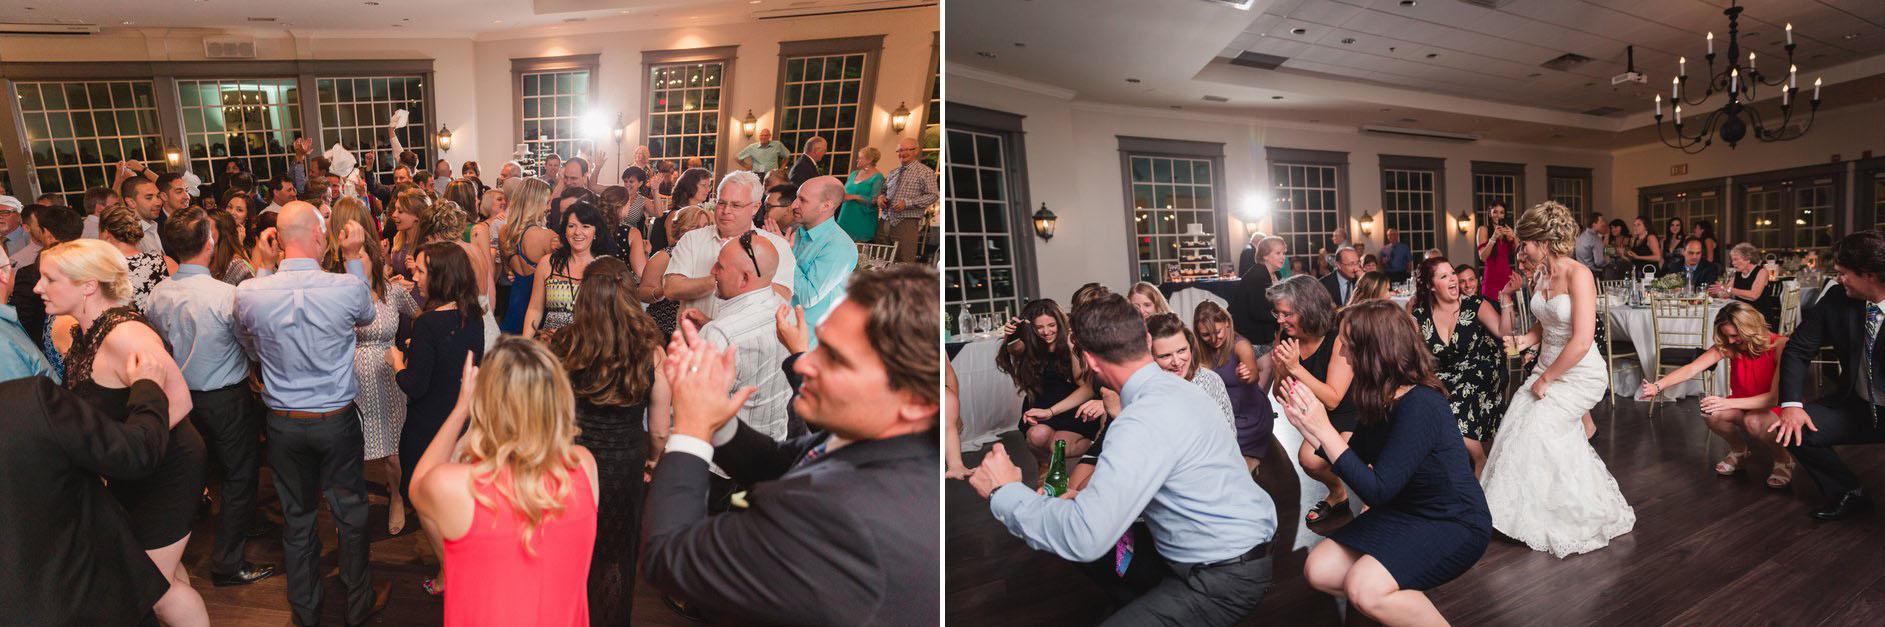 Kleinburg-Doctors-house-wedding-J-C-2016-071